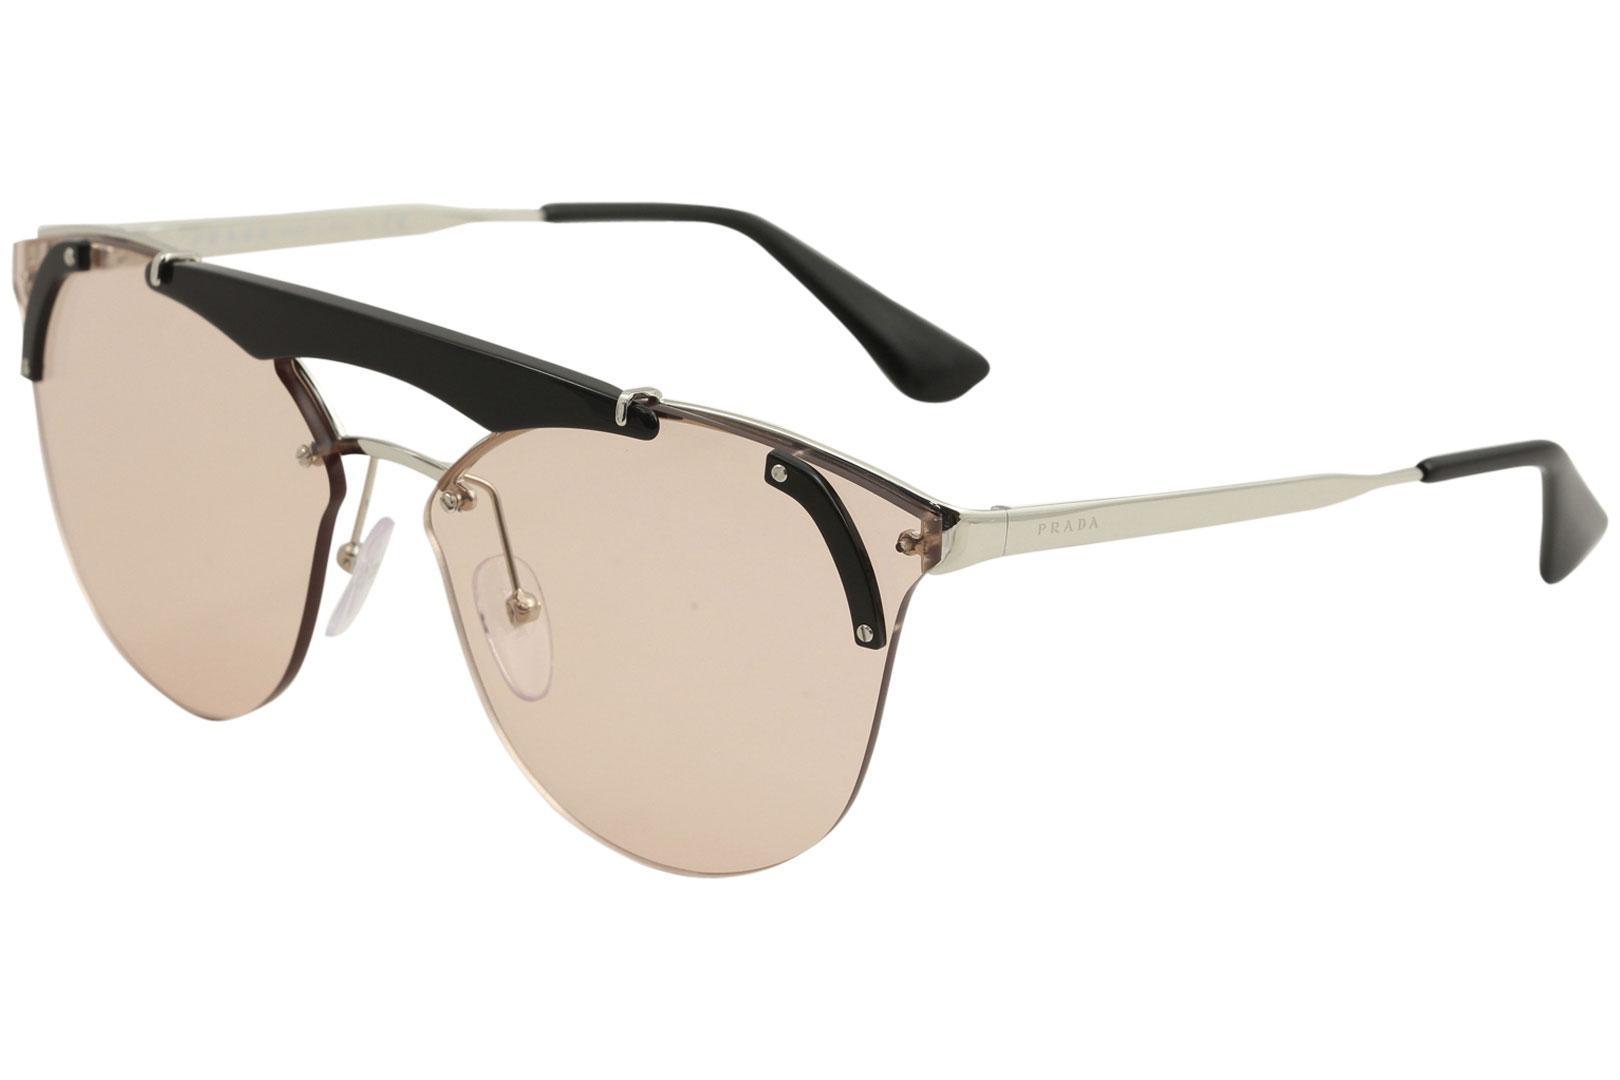 7b55ac283f Prada Women s SPR53U SPR 53U Fashion Pilot Sunglasses